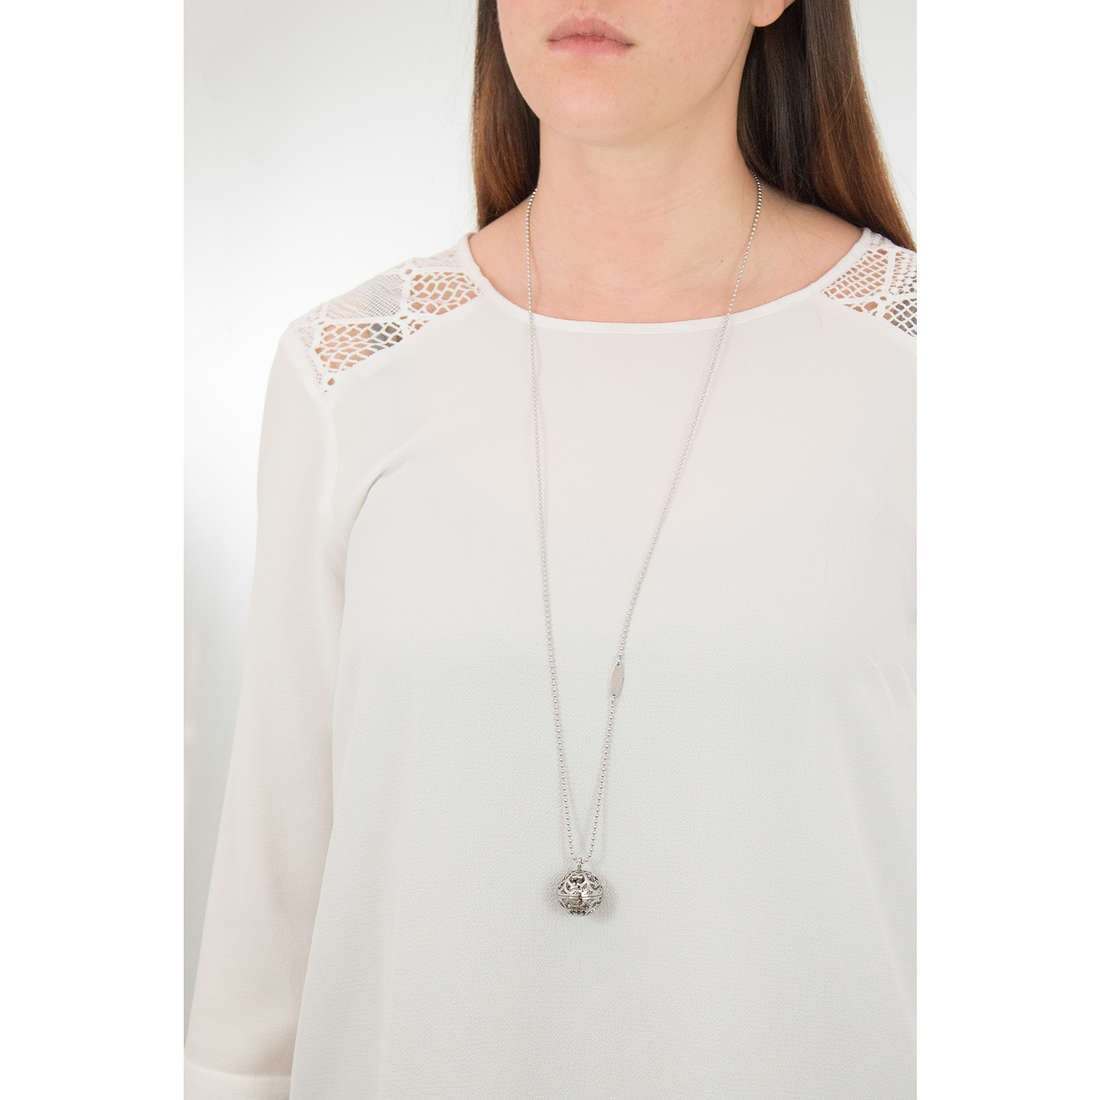 Luca Barra necklaces woman LBCK1053 indosso